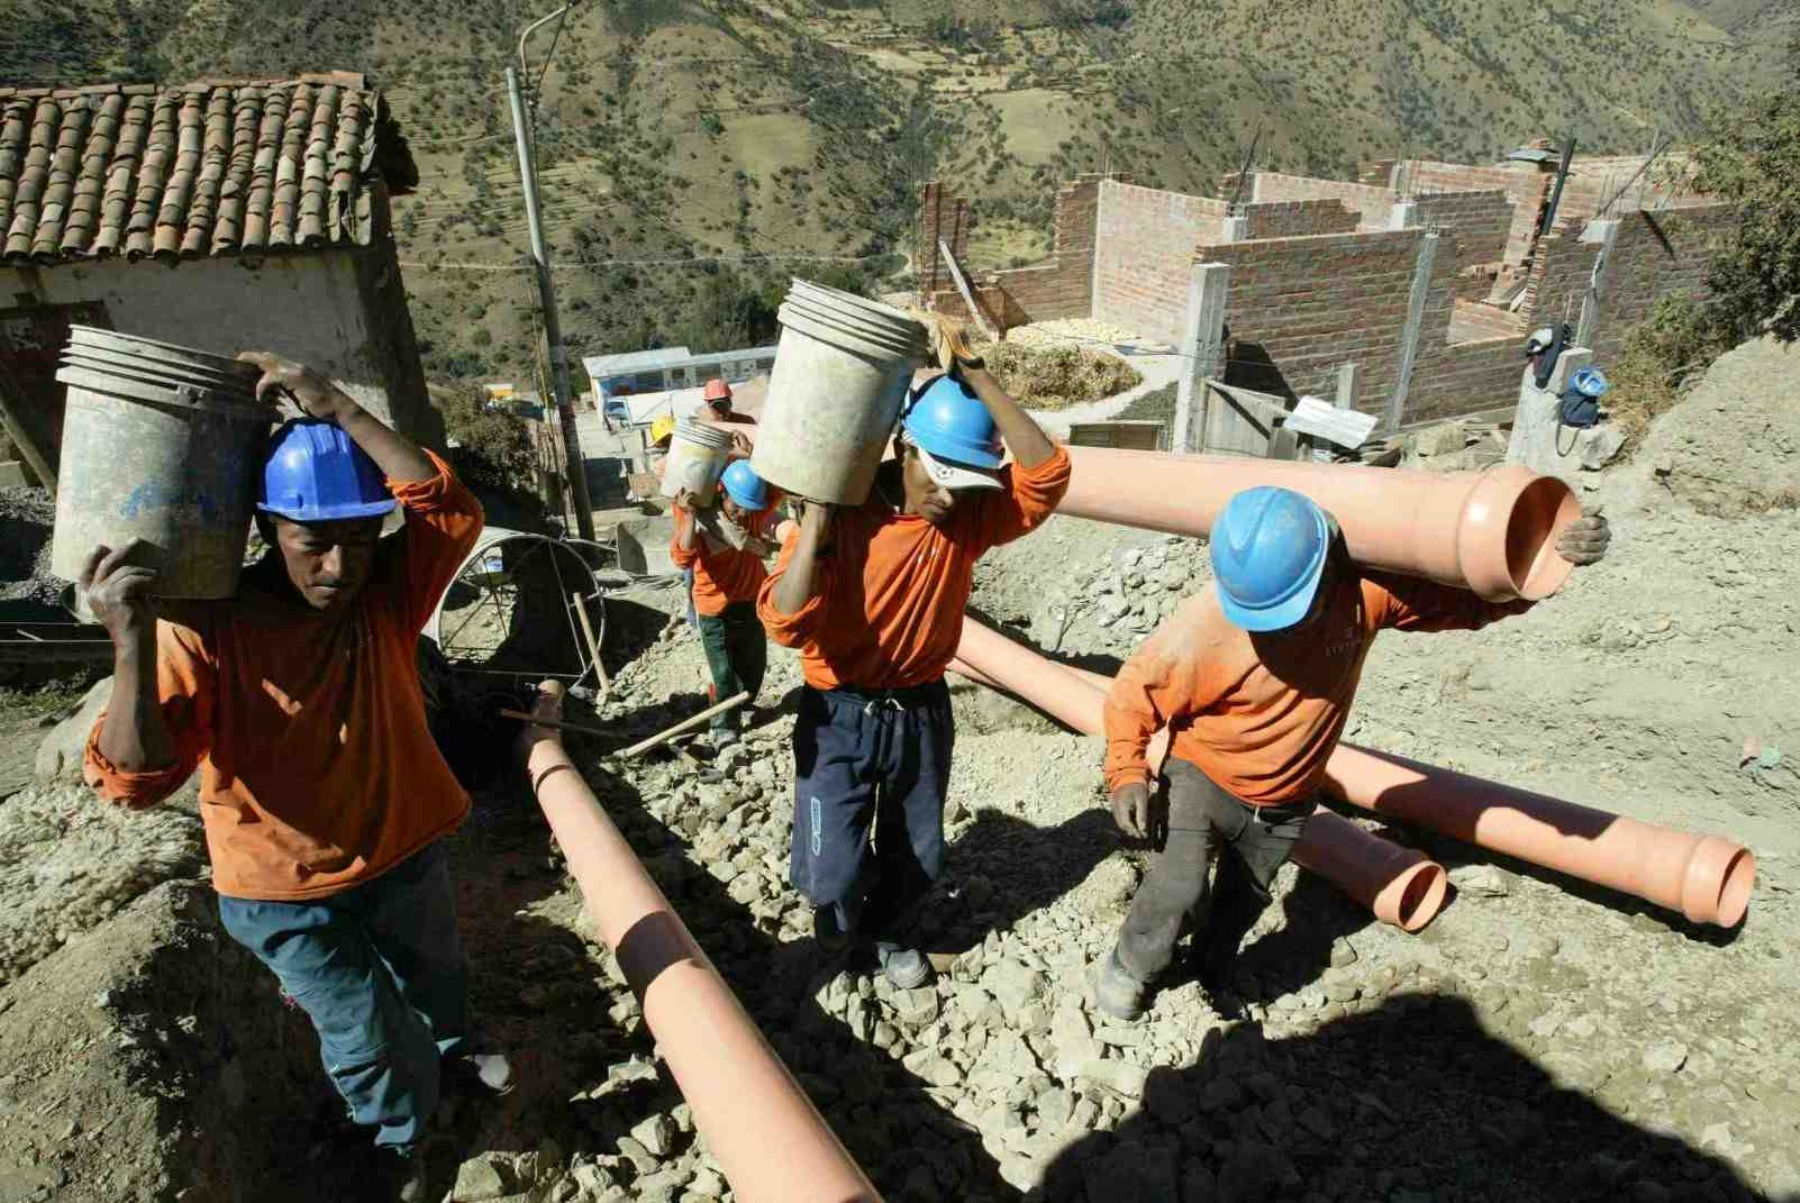 Foto: Archivo Andina